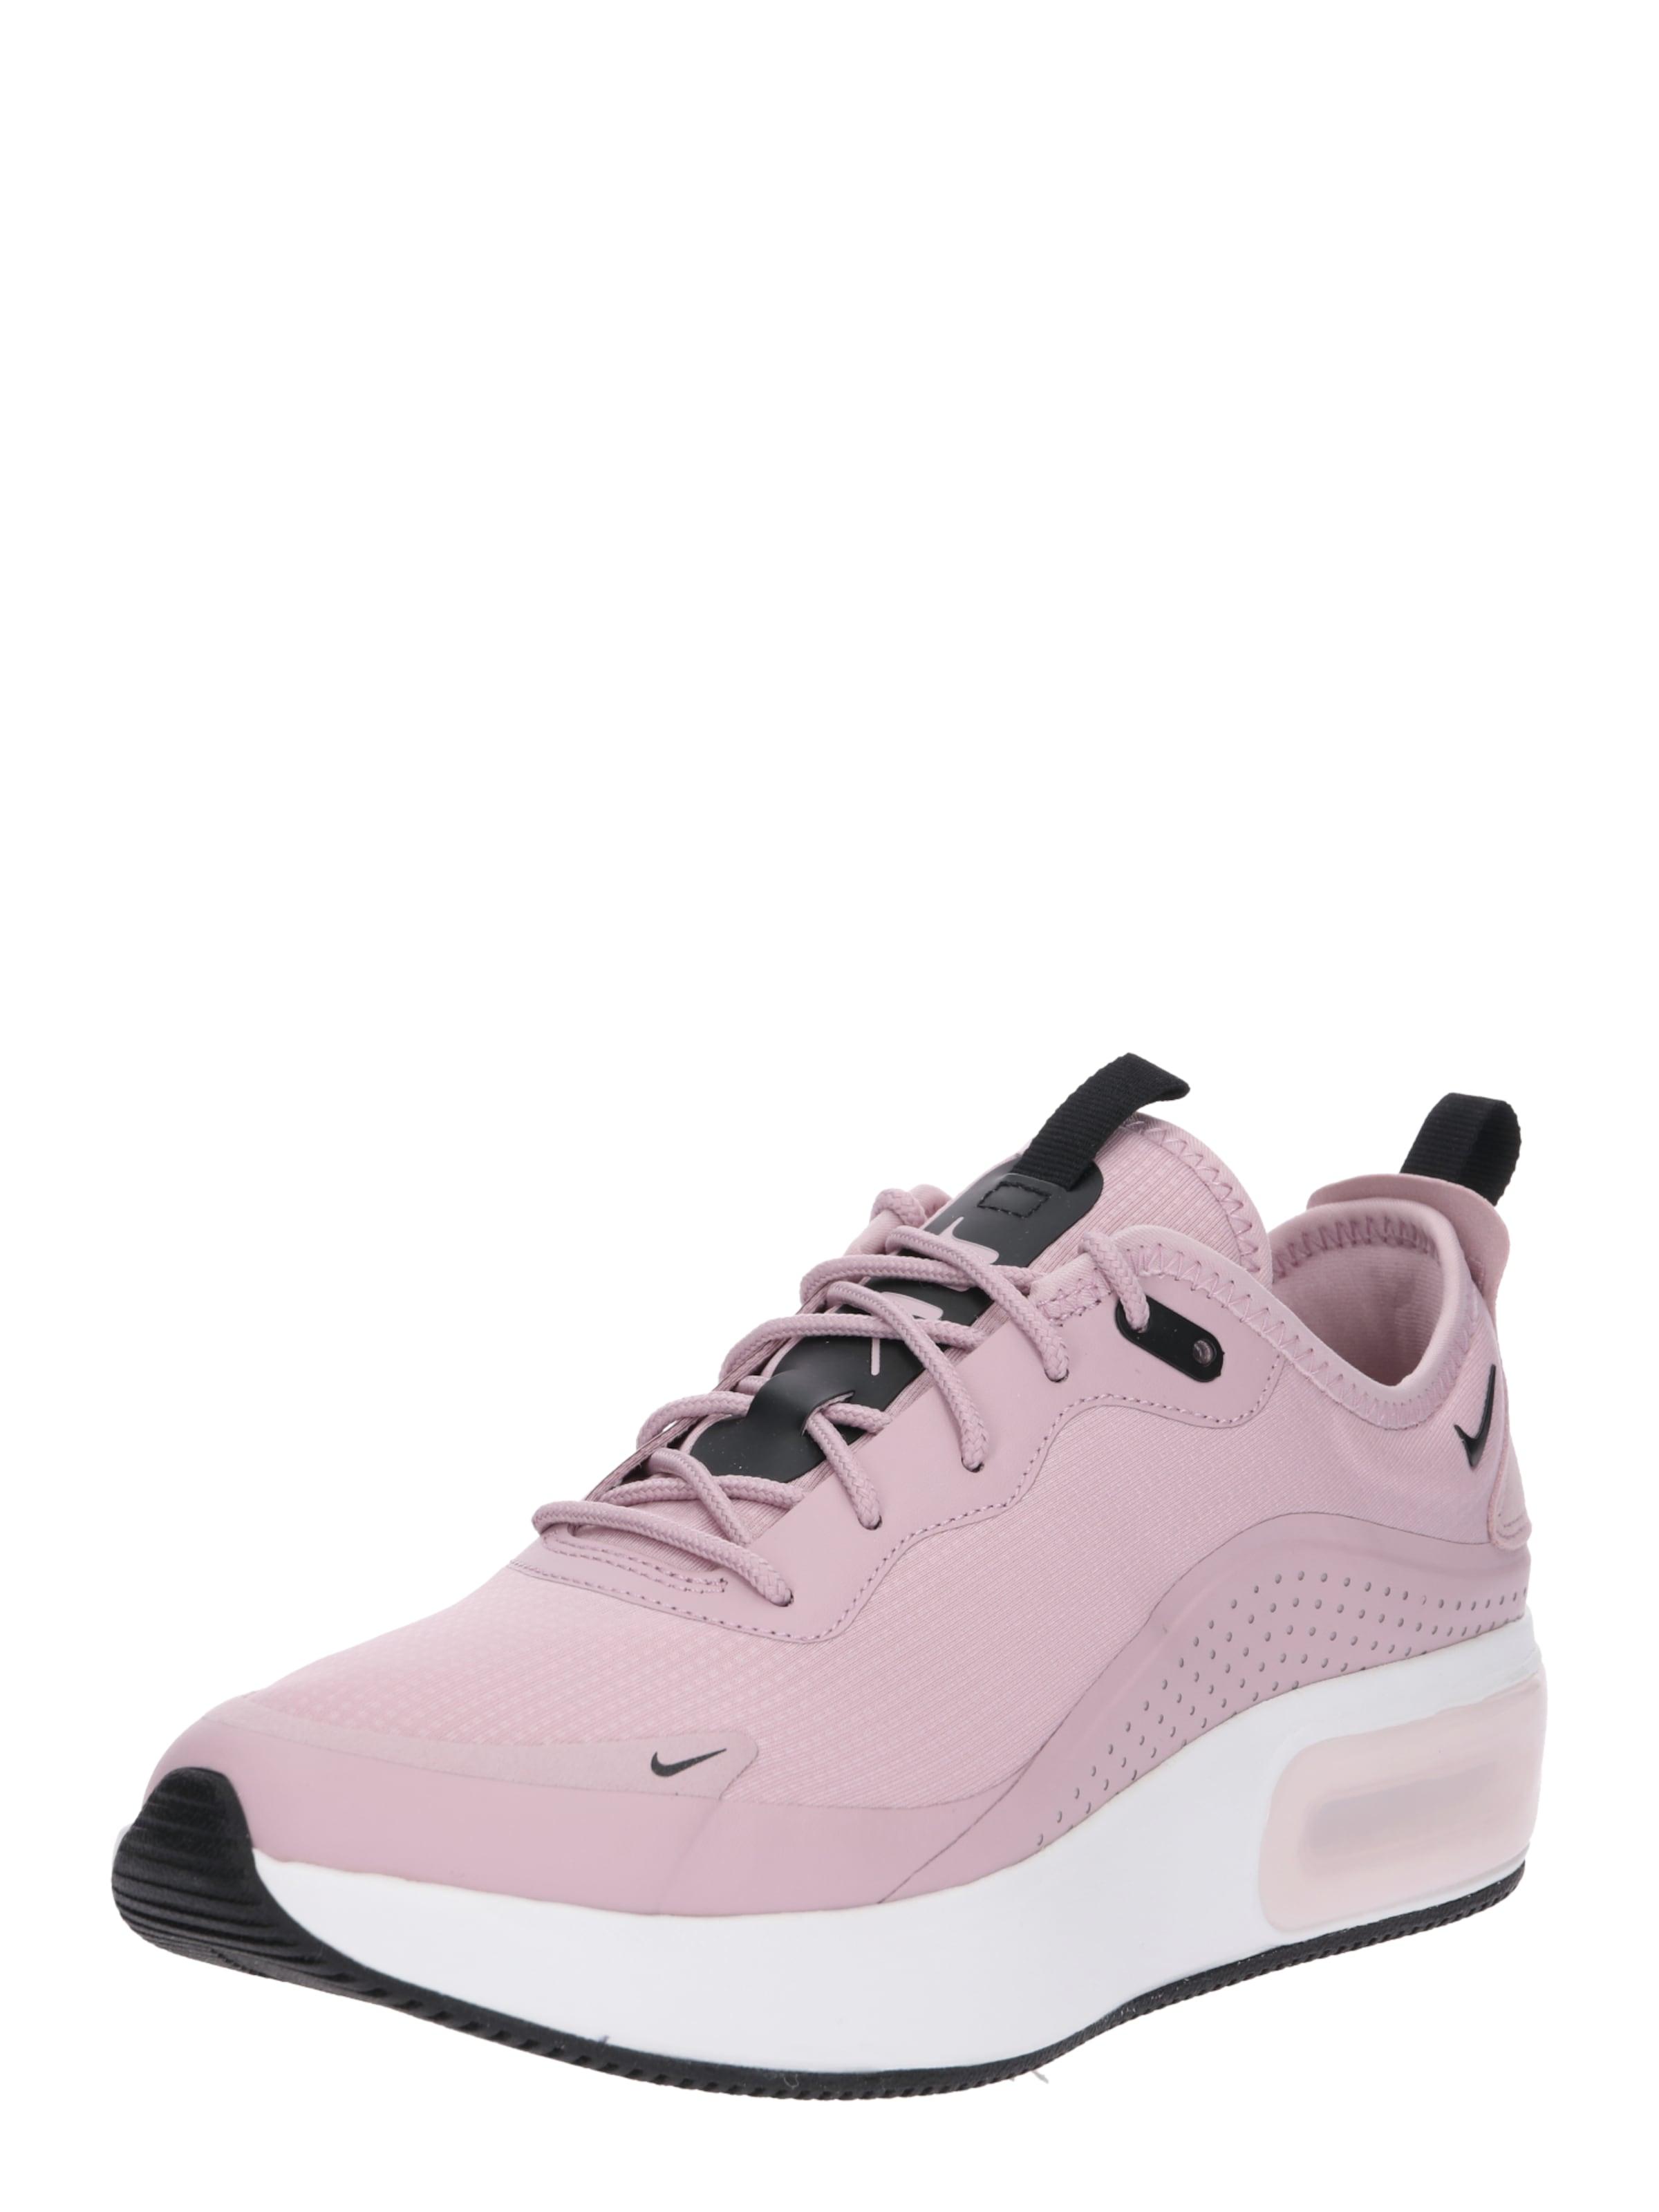 Basses Sportswear Max Dia' Nike 'nike Lilas Baskets Blanc En Air wEAdqPd